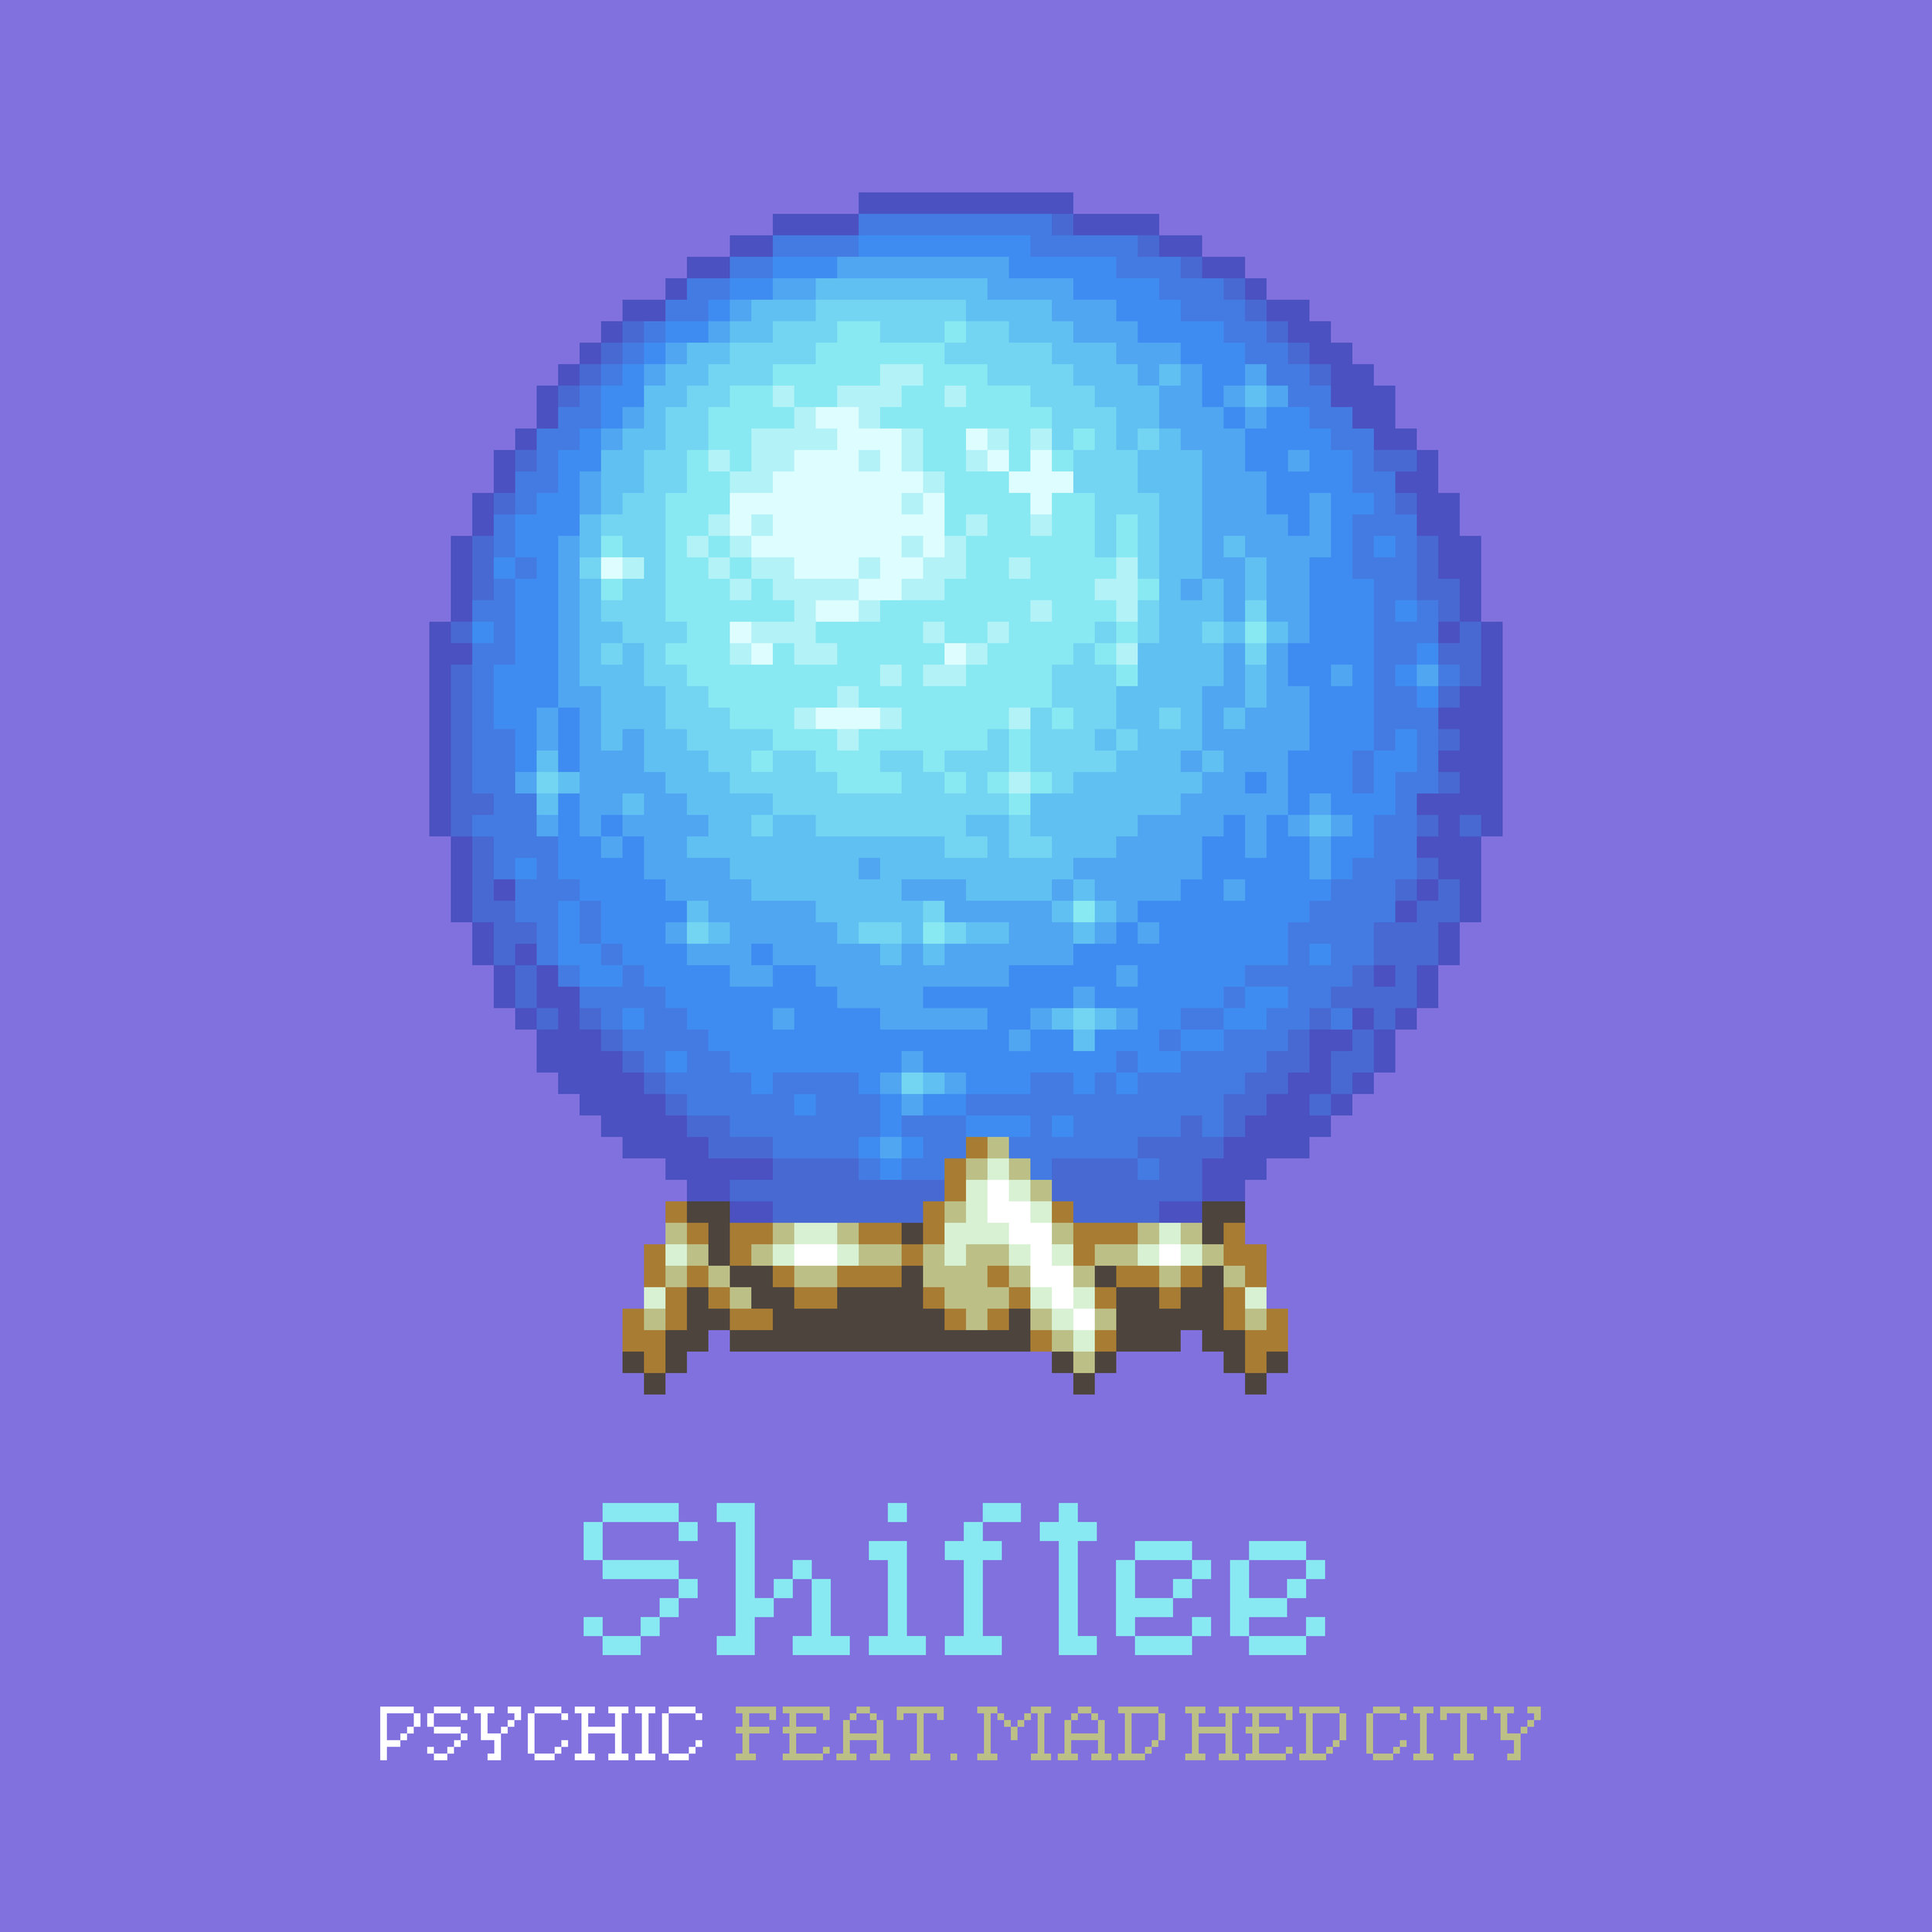 Shiftee - Psychic ART UPDATE.jpg